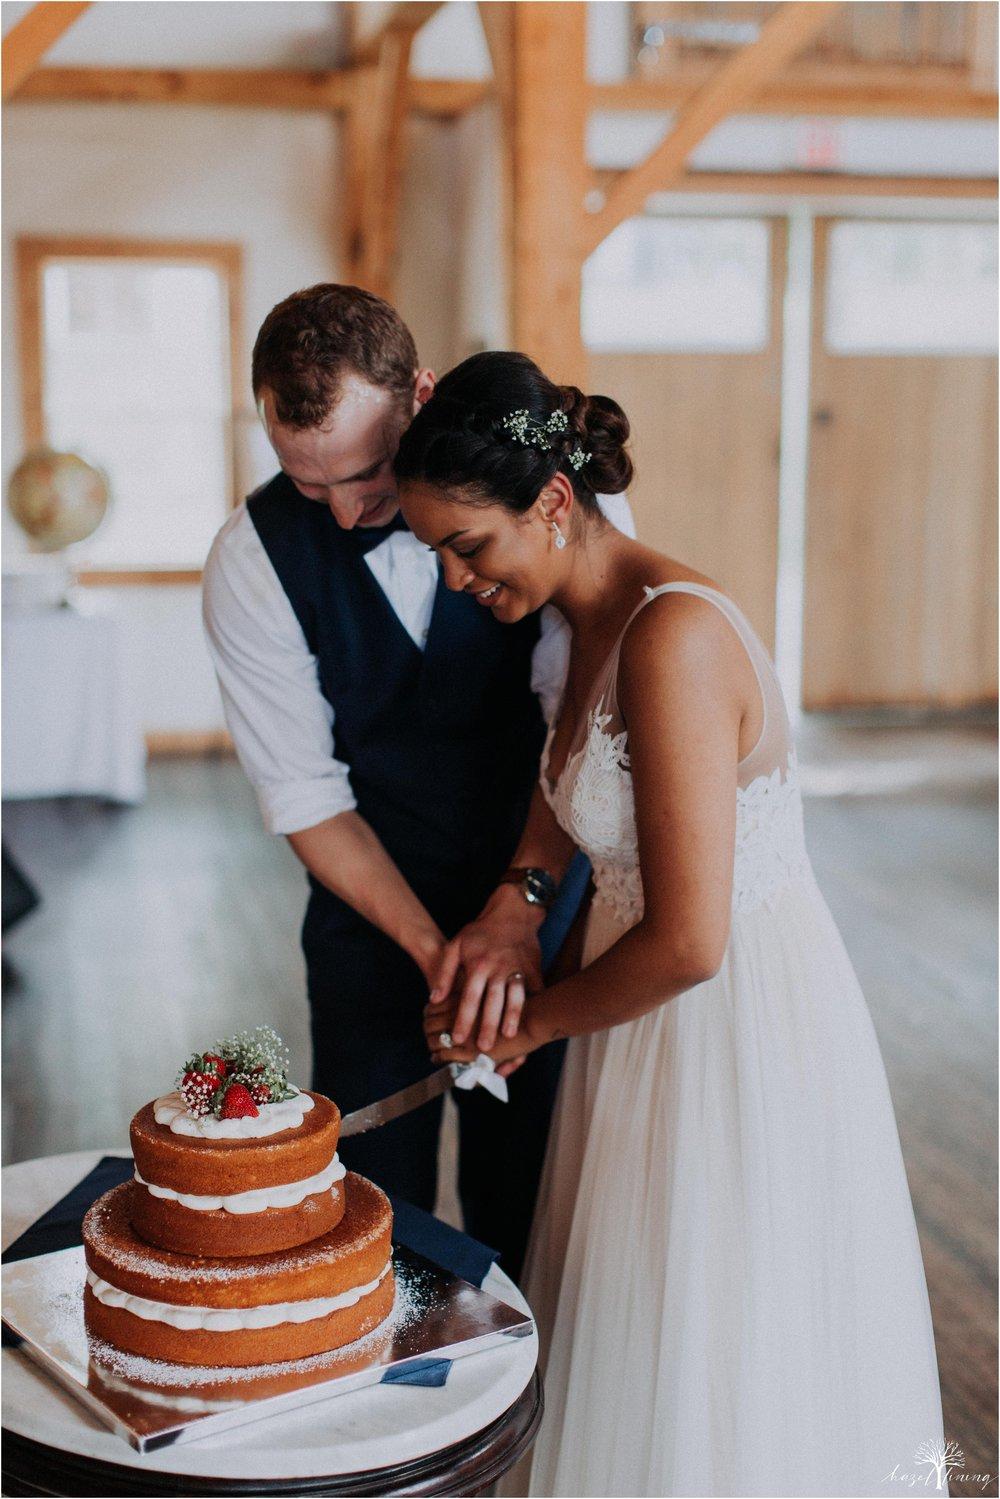 mariah-kreyling-samuel-sherratt-sherrattwiththeworld-peirce-farm-at-witch-hill-boston-massachusetts-wedding-photography-hazel-lining-travel-wedding-elopement-photography_0175.jpg